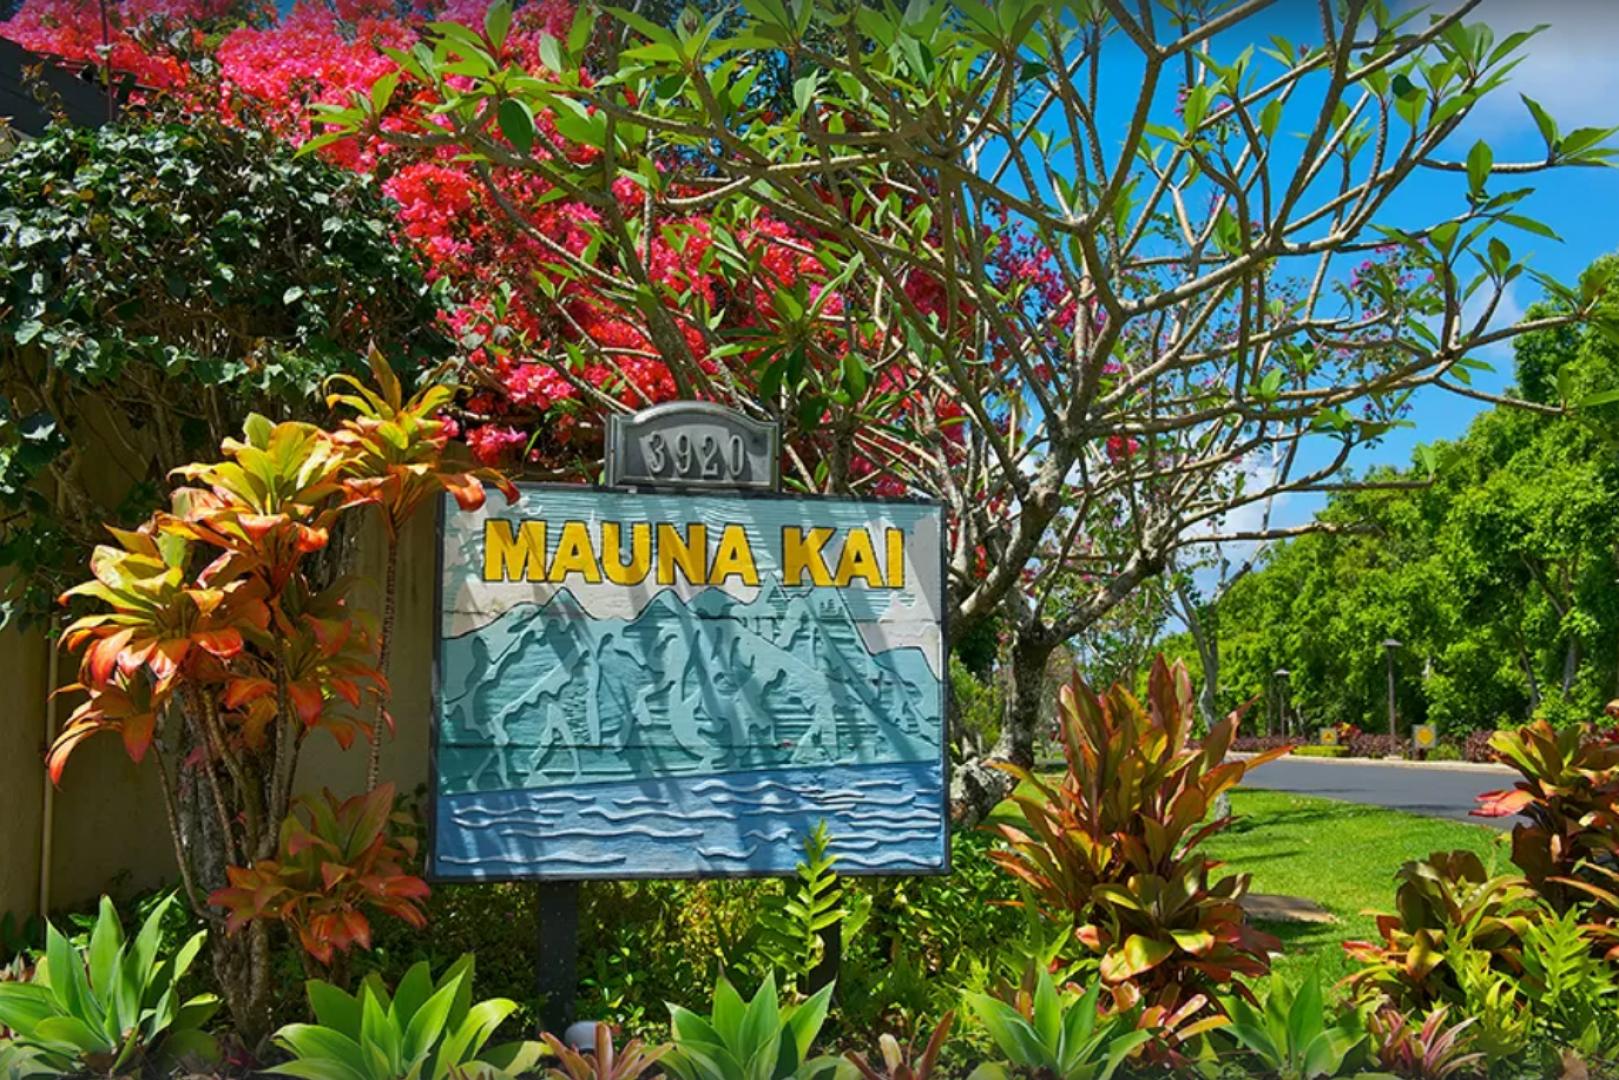 Mauna Kai entrance